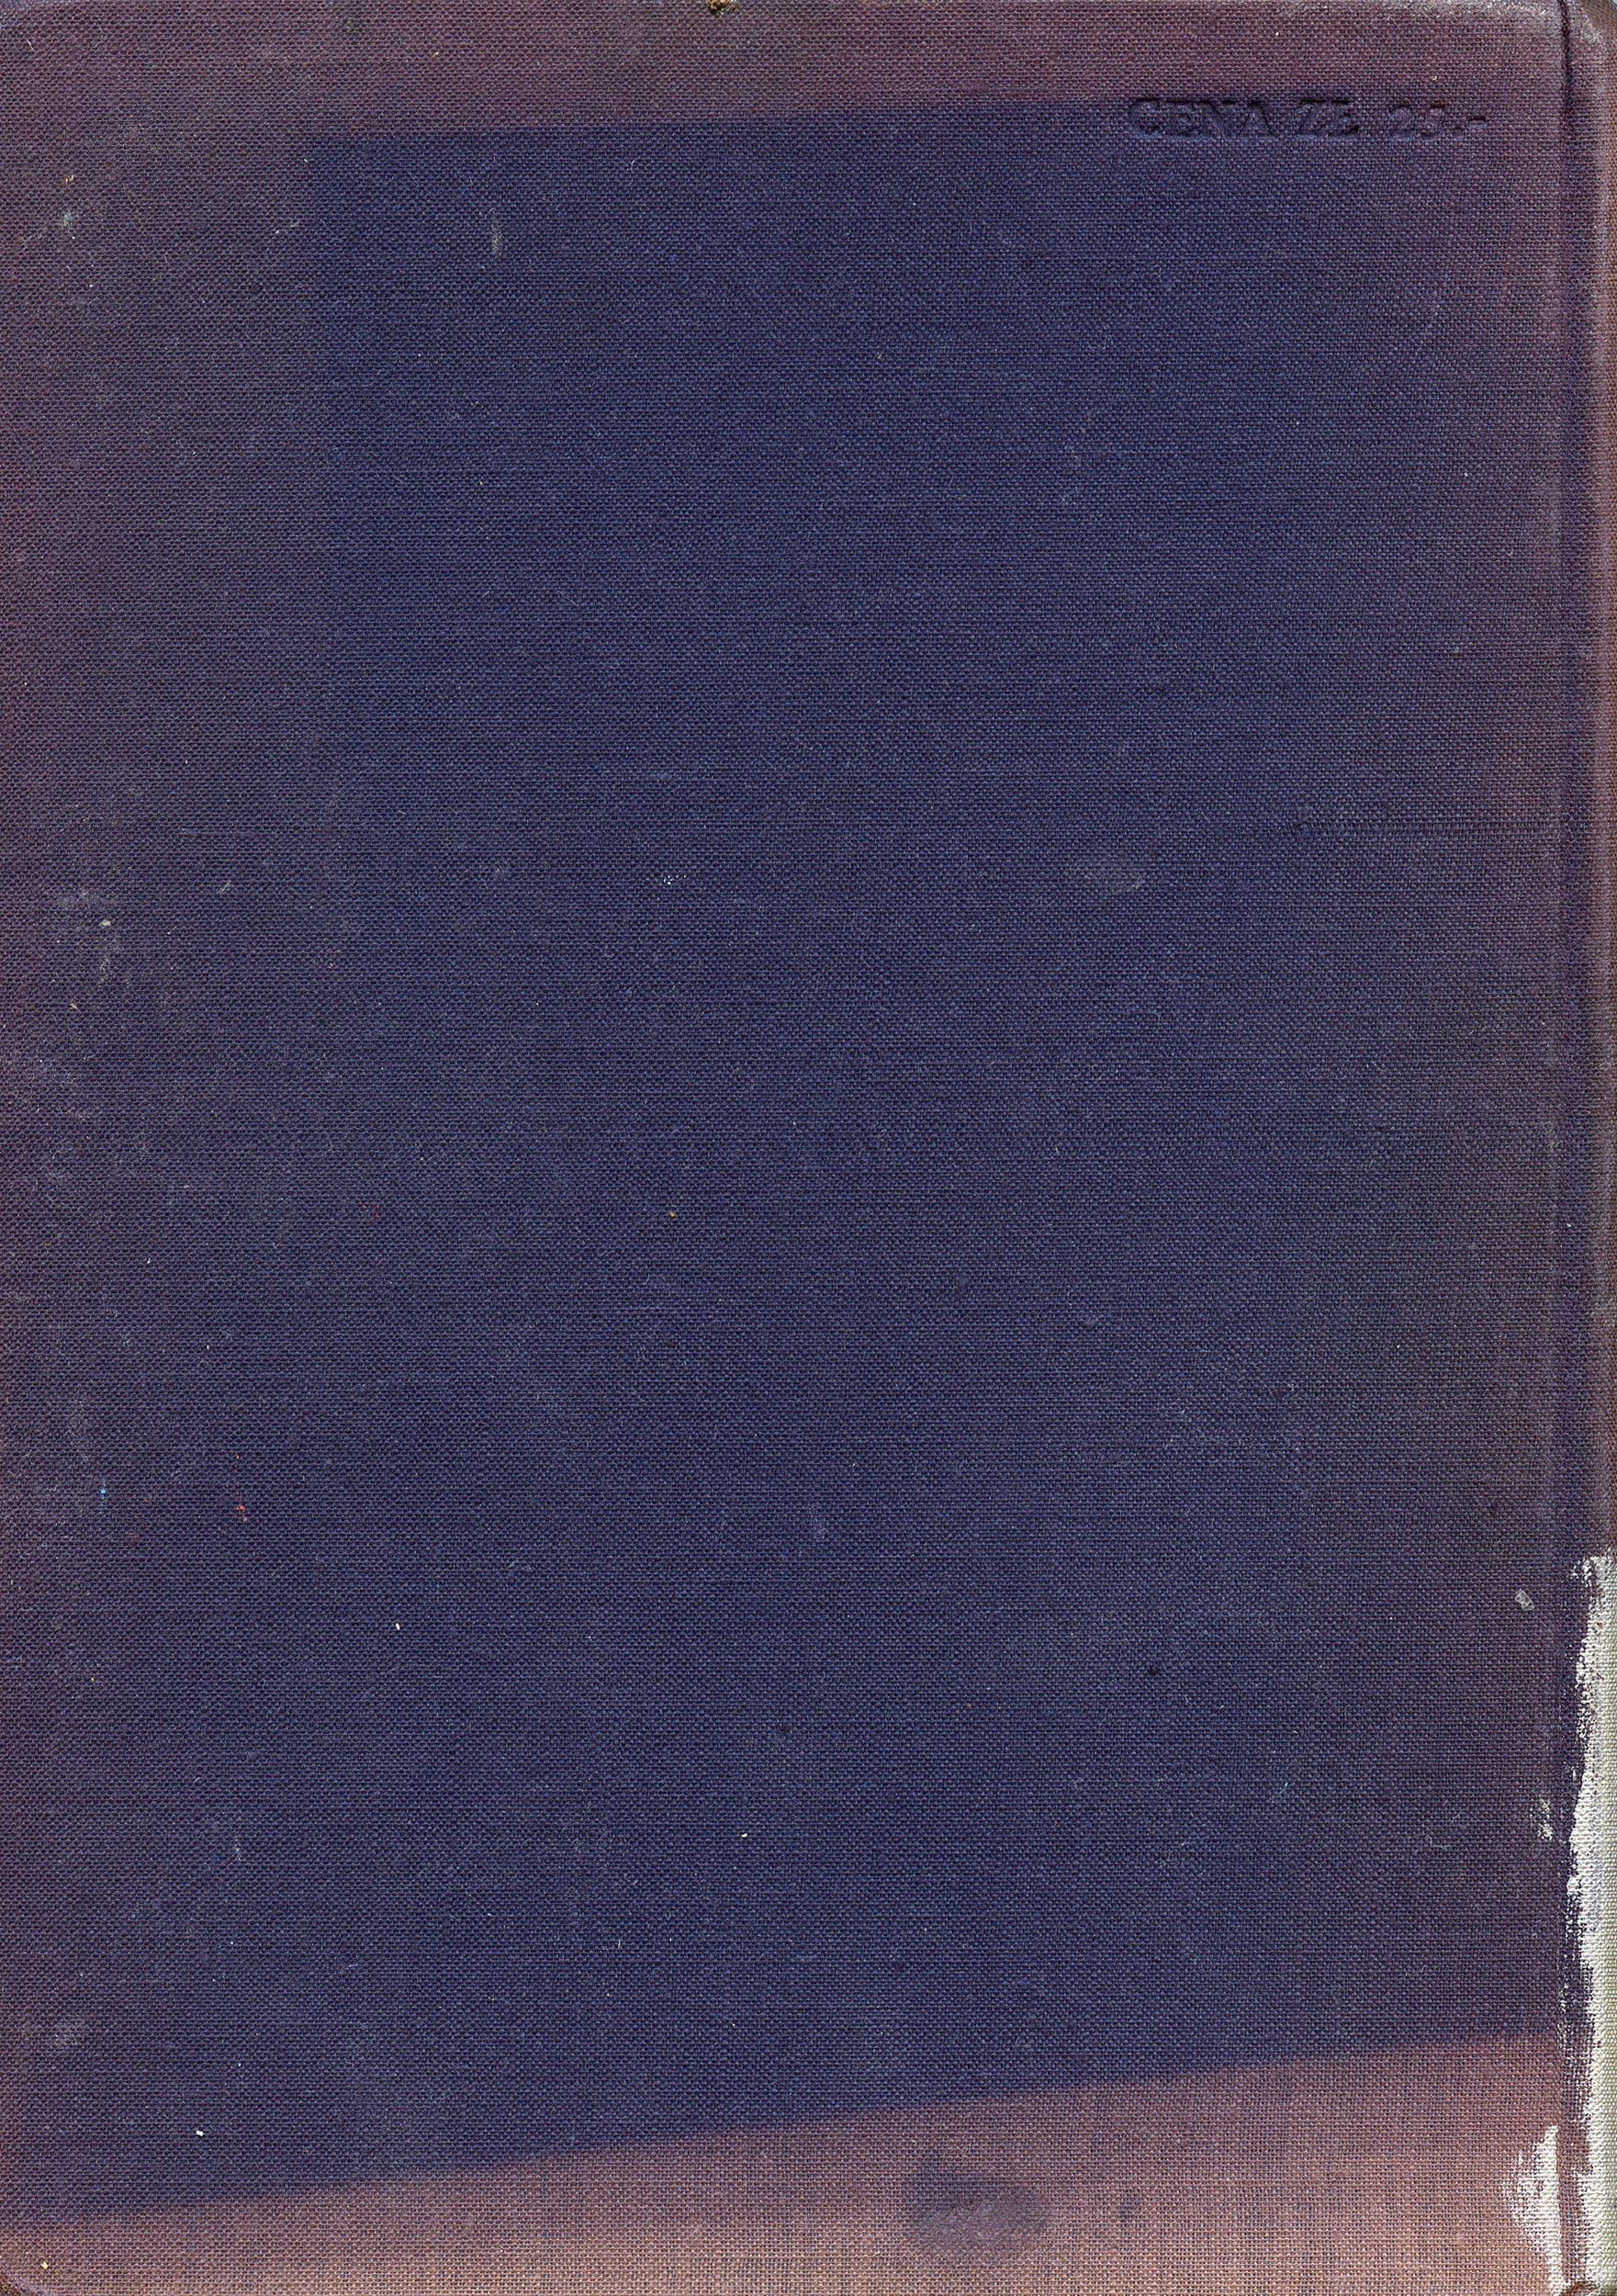 Blue book cover